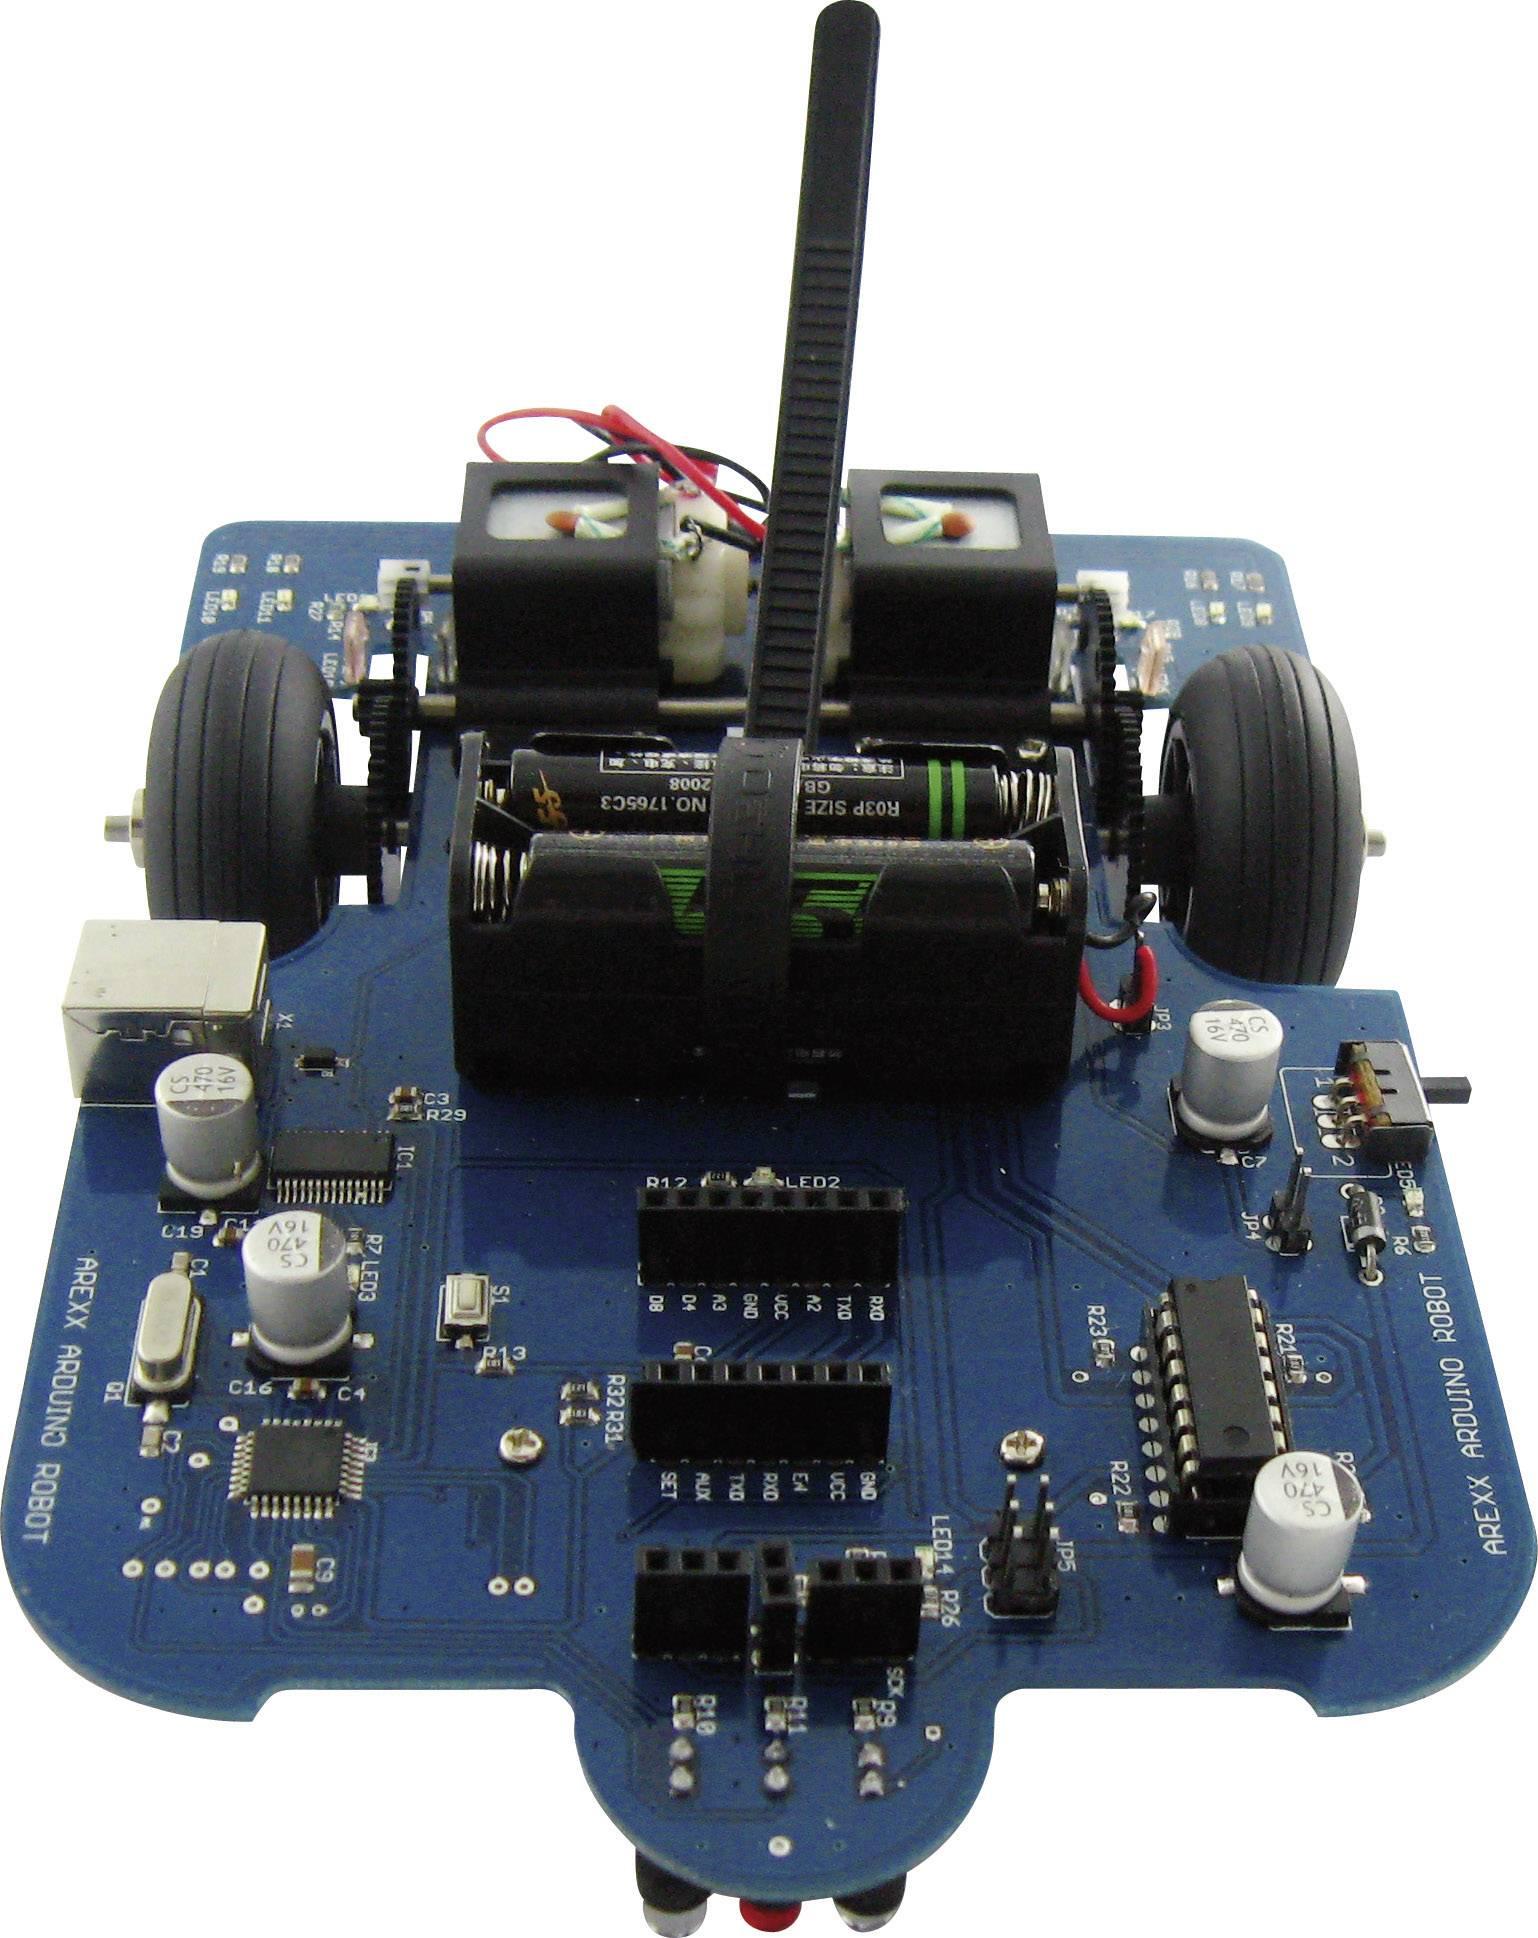 Stavebnice programovatelného Arduino robota, Arexx AAR-04